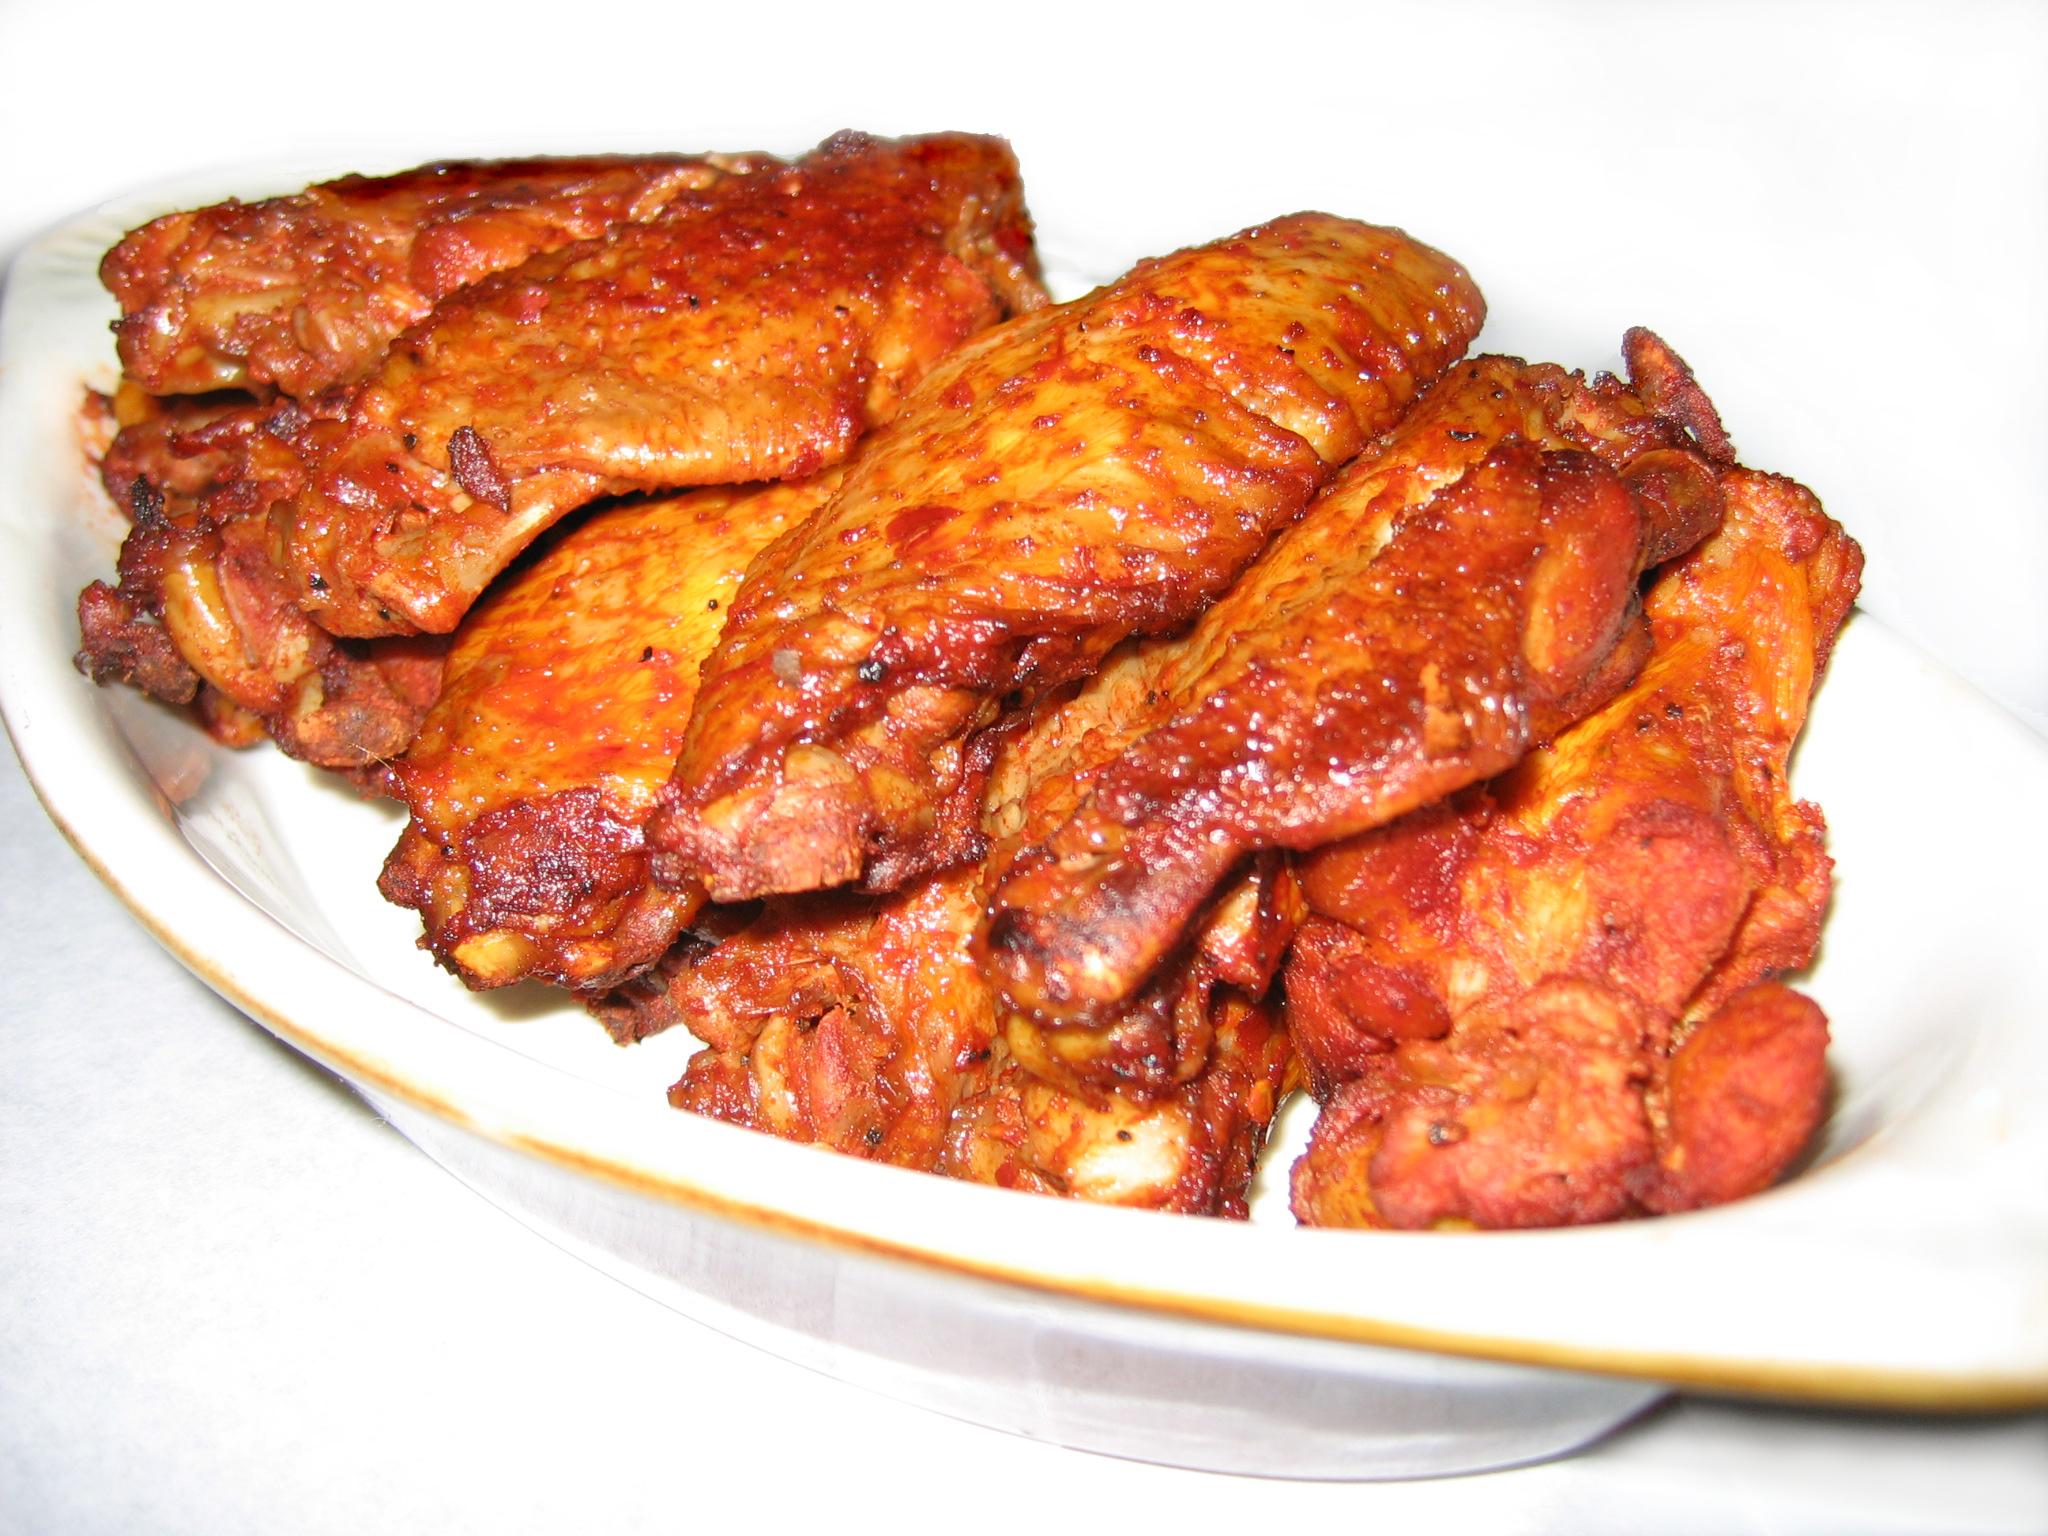 Алитас де пойо (пряные куриные крылышки)